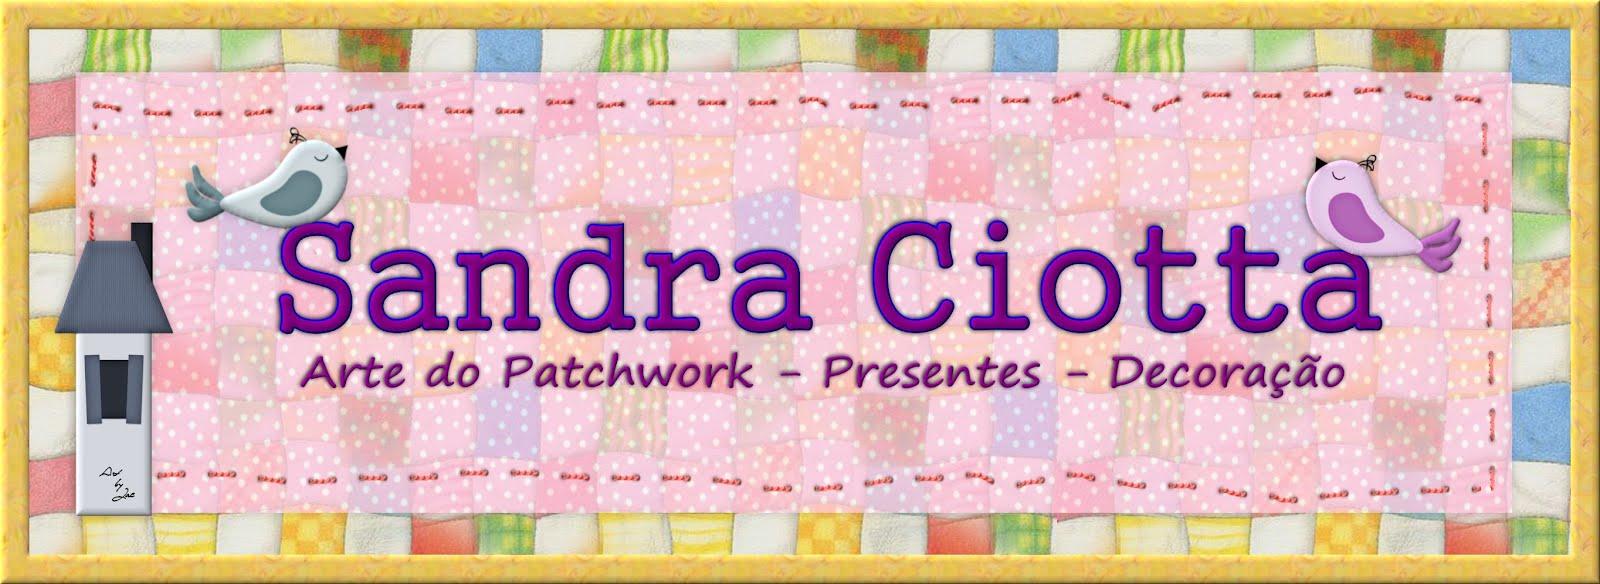 Artes da Sandra